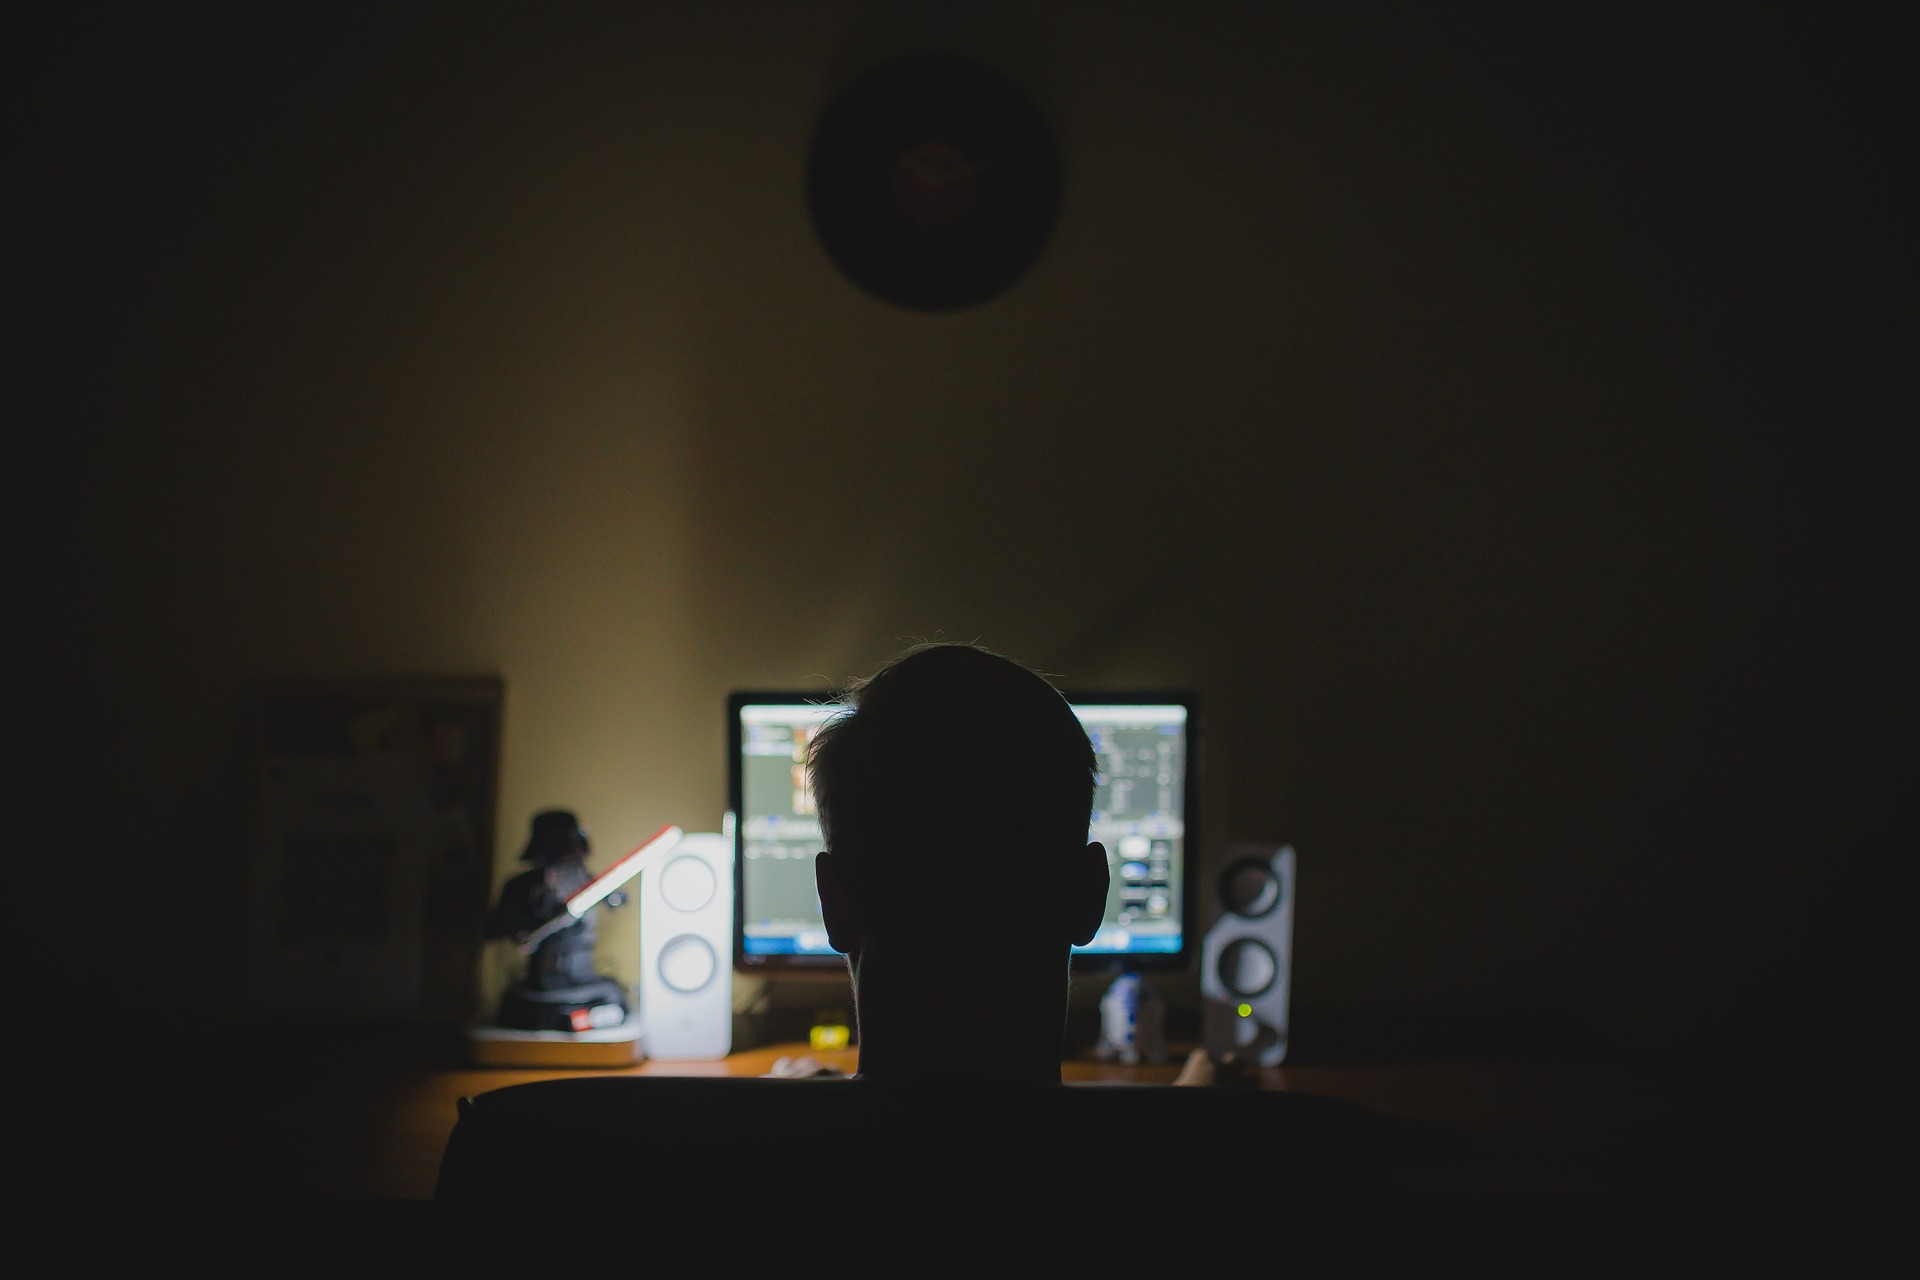 【IT業界の働き方改革】エンジニアの長時間労働を改善するための取り組みをご紹介のアイキャッチイメージ